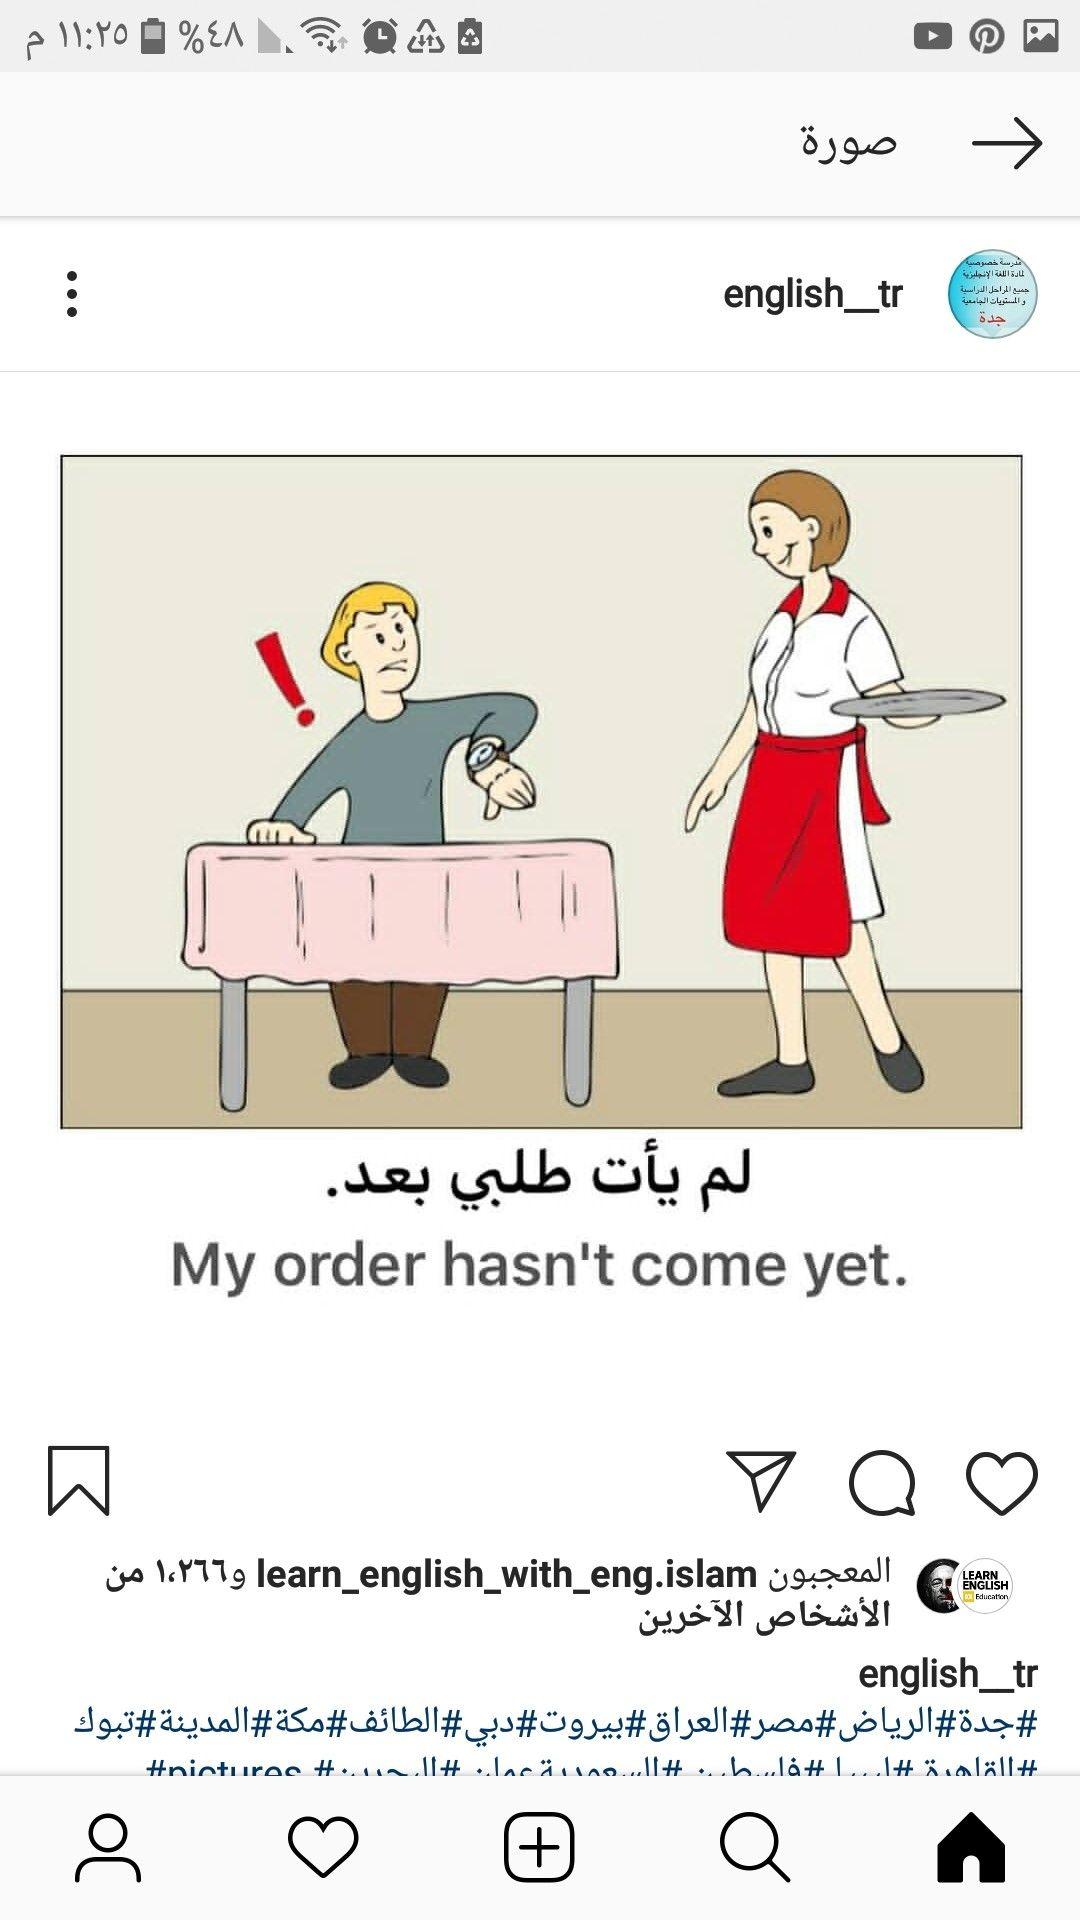 Pin By Aisha Wali Salsa On Learn English تعلم الانجليزية English Language Learning Grammar English Language Learning English Language